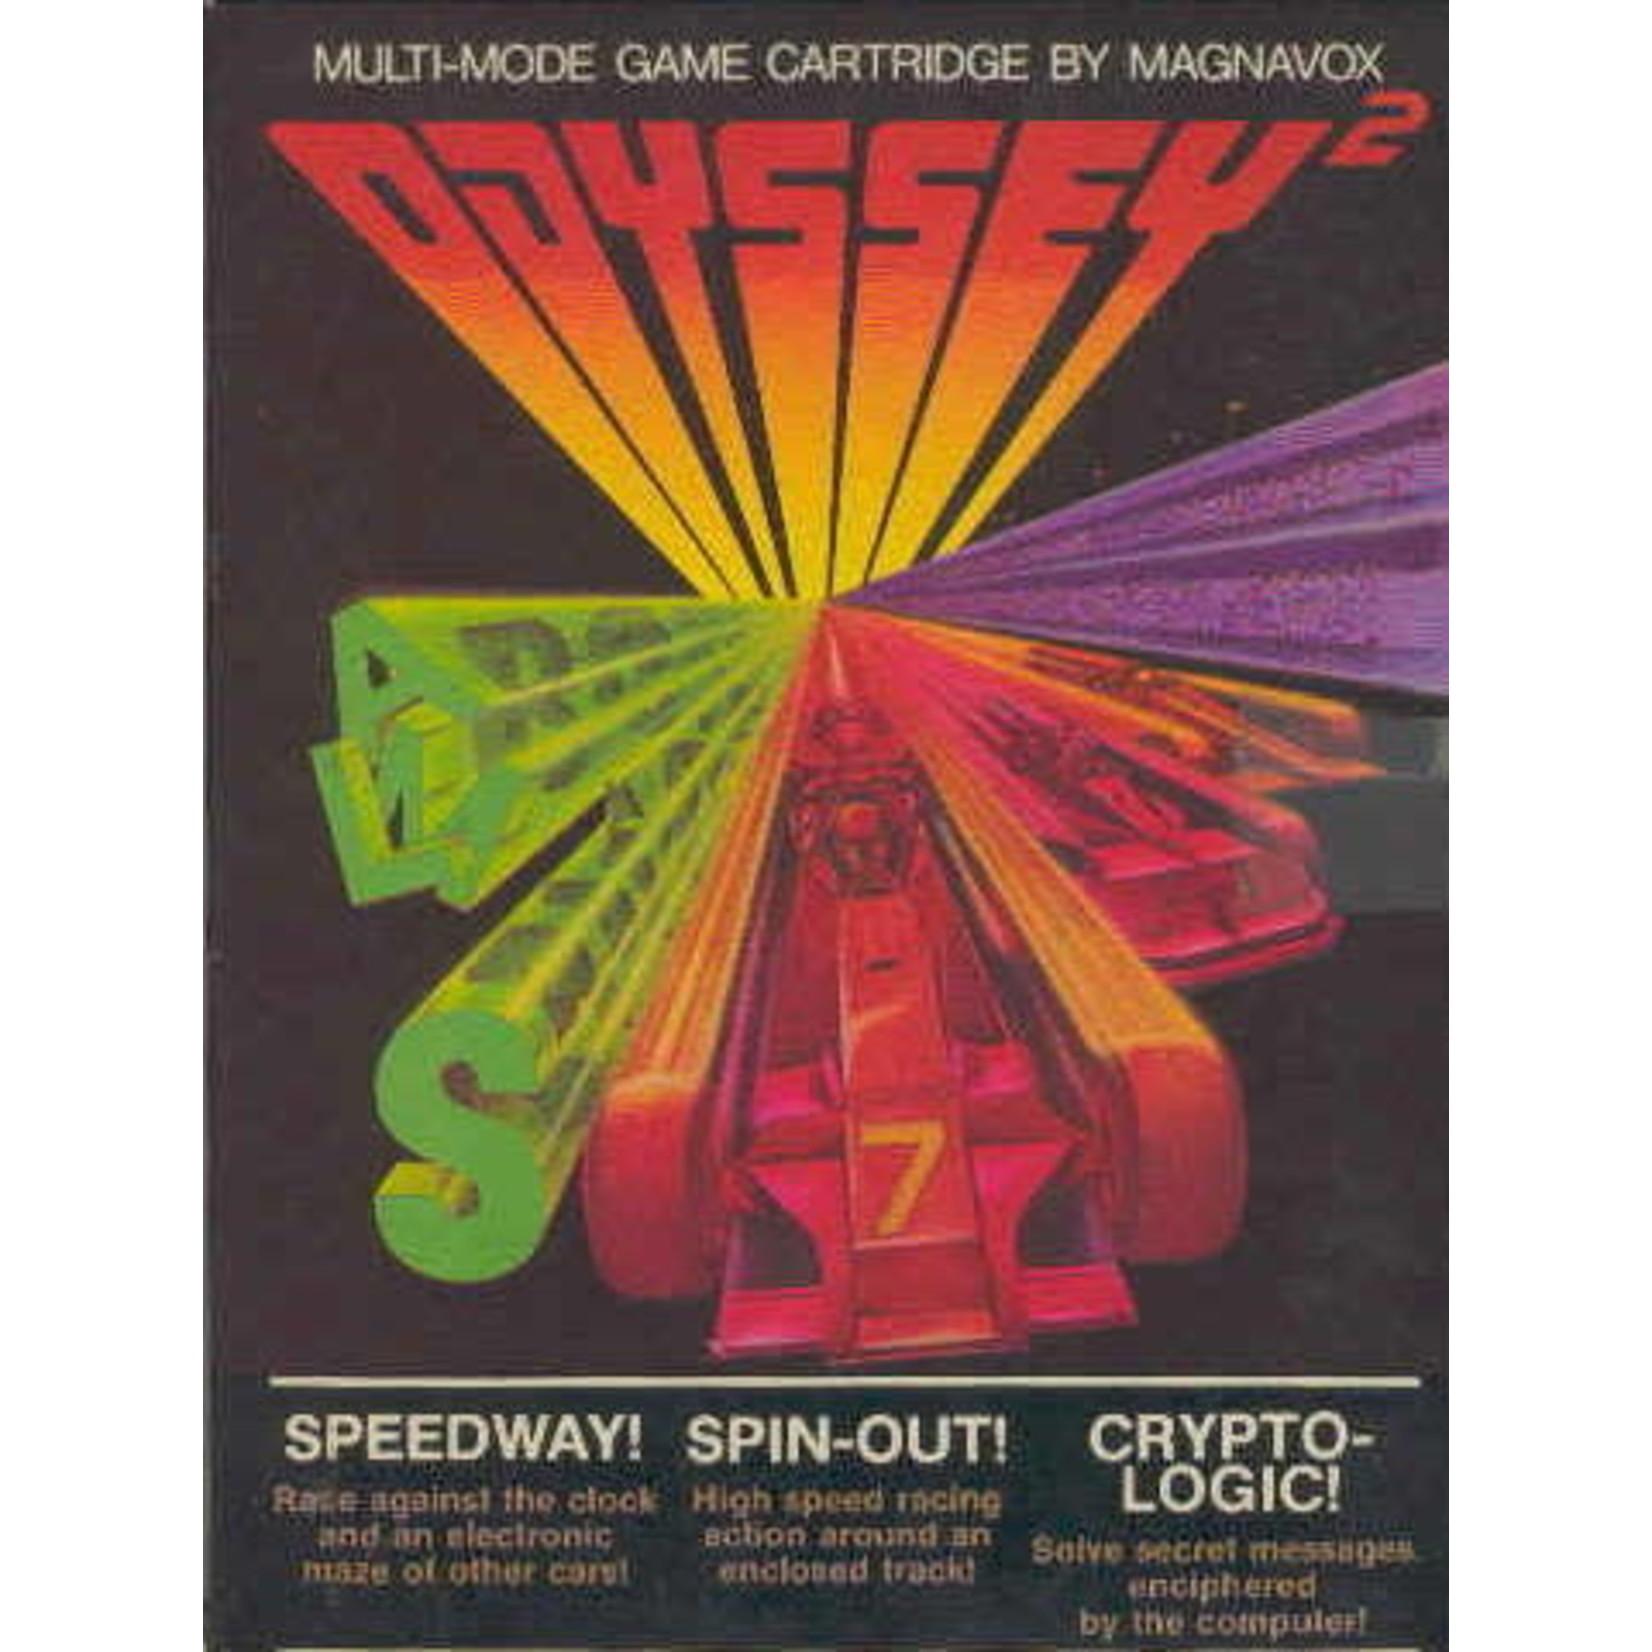 OD2U-Speedway & Spinout & Crypto-Logic (Boxed)